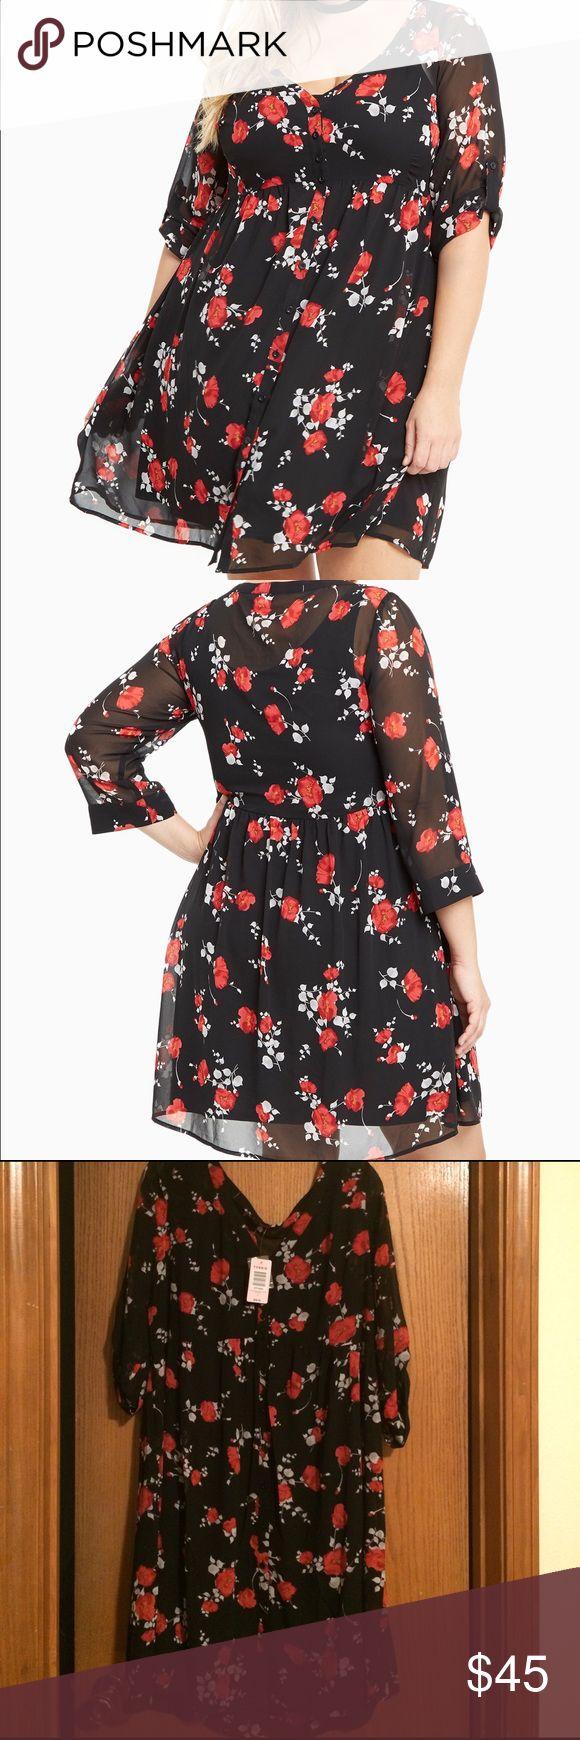 Torrid shirt dress Super cute floral print chiffon shirt dress from Torrid.  Too big on me.  Size 1 torrid Dresses Midi